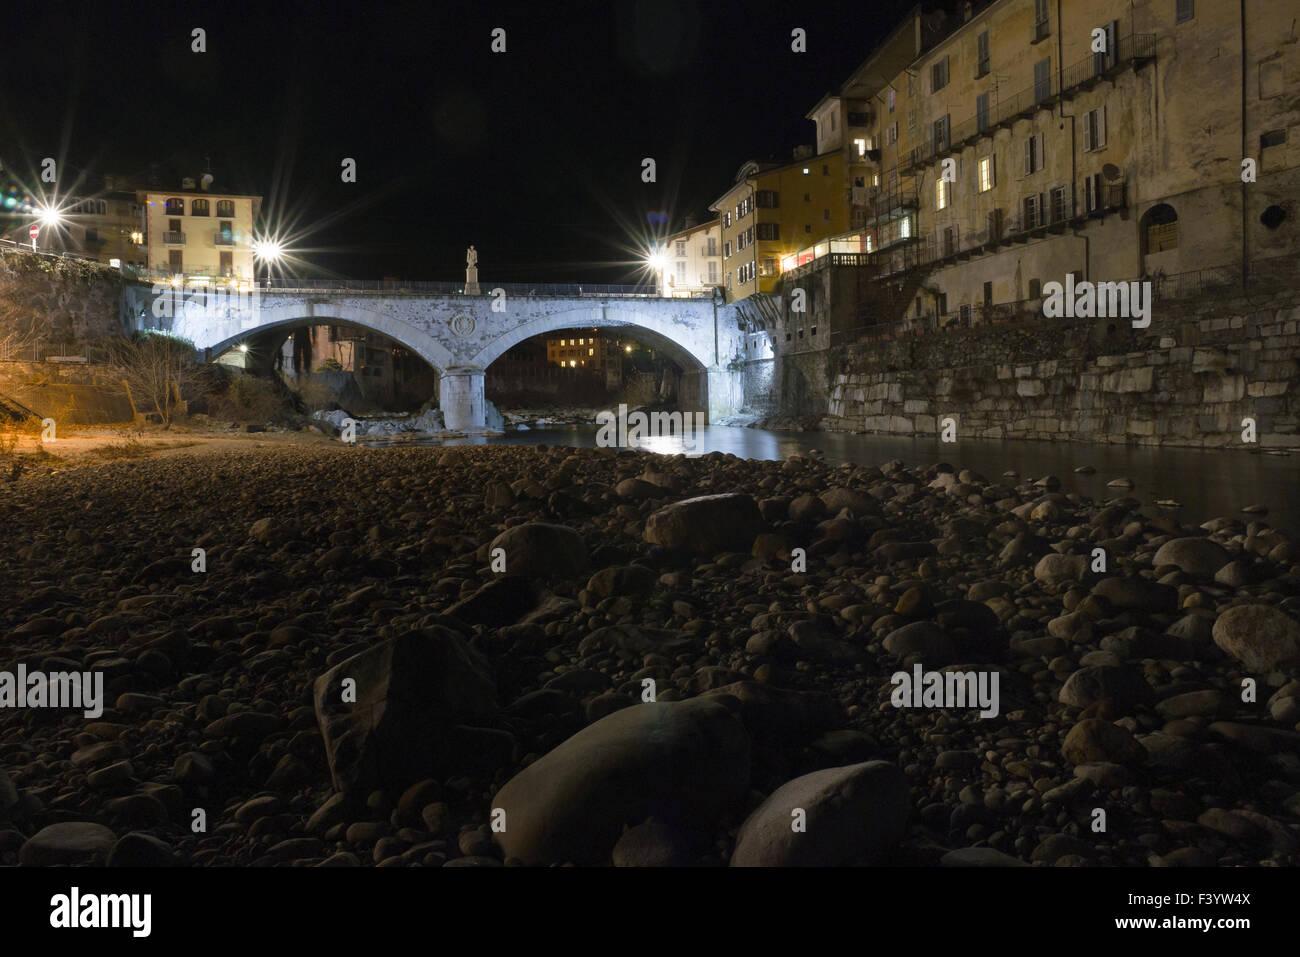 The river Sesia, night, Varallo Stock Photo